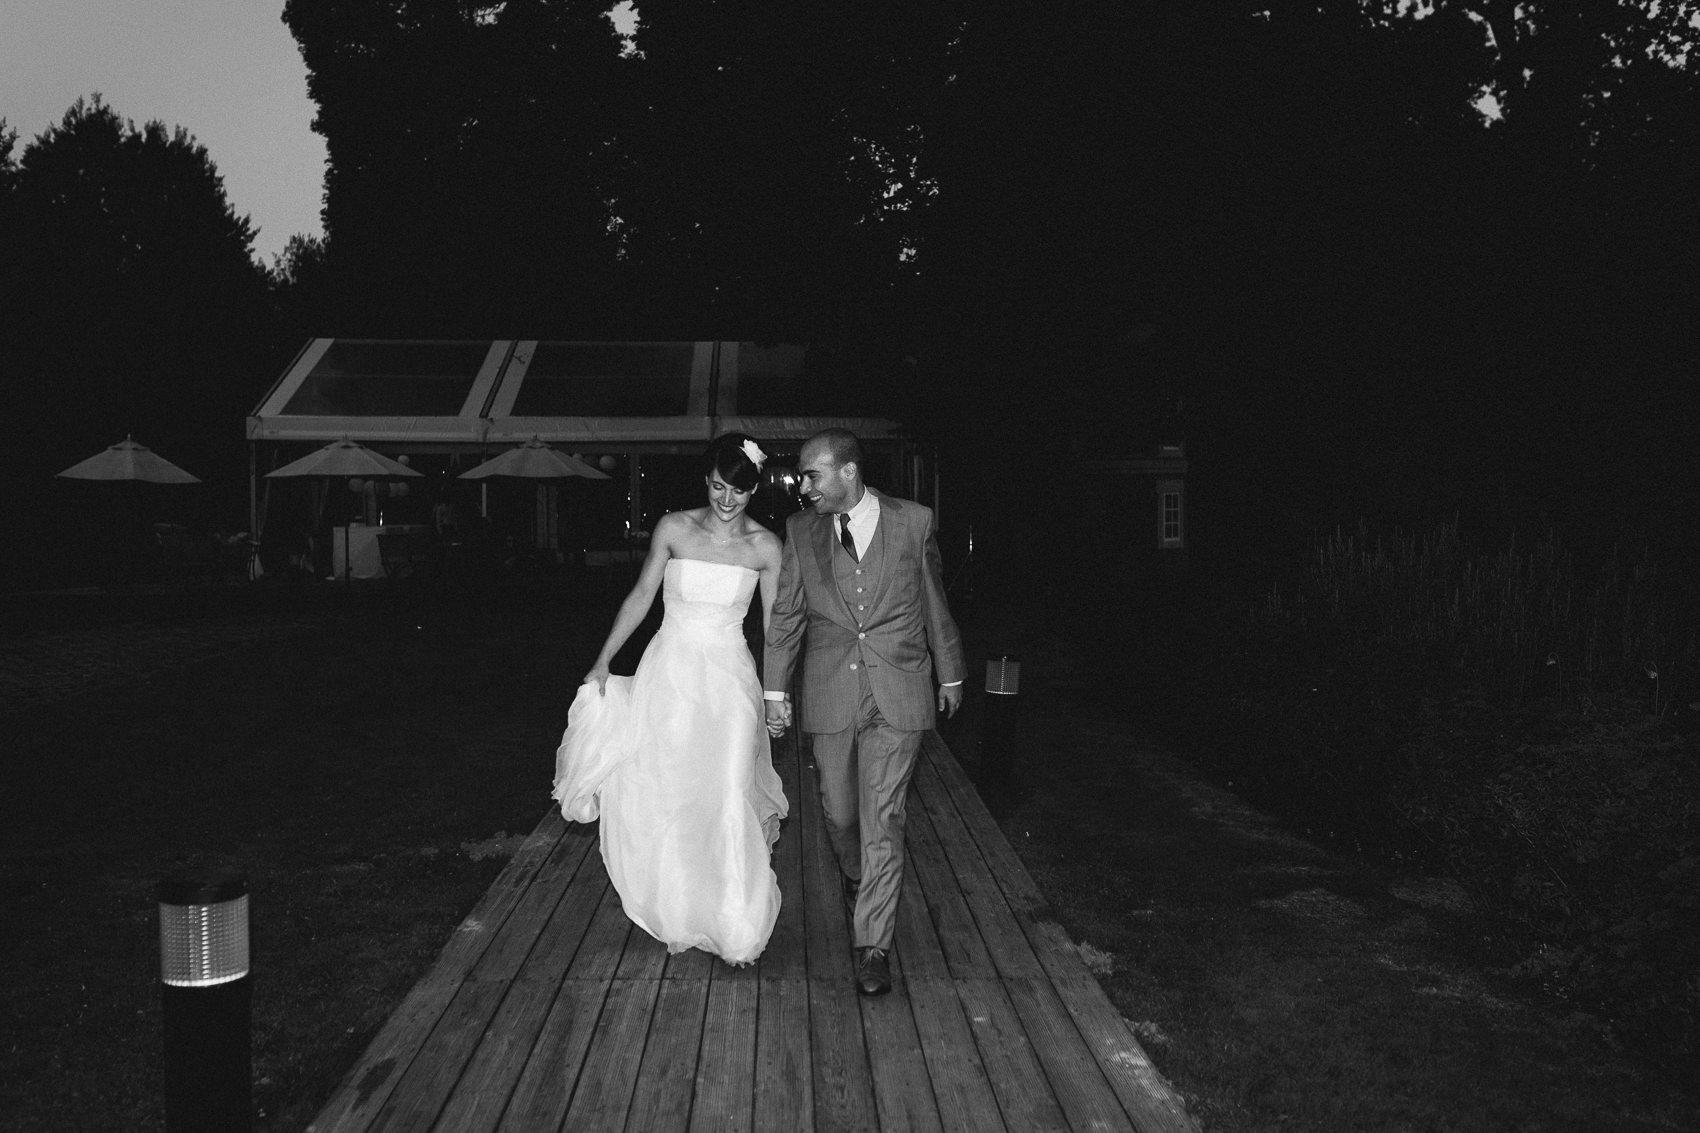 mariage-charlotte-et-joel-trendzphotography-114